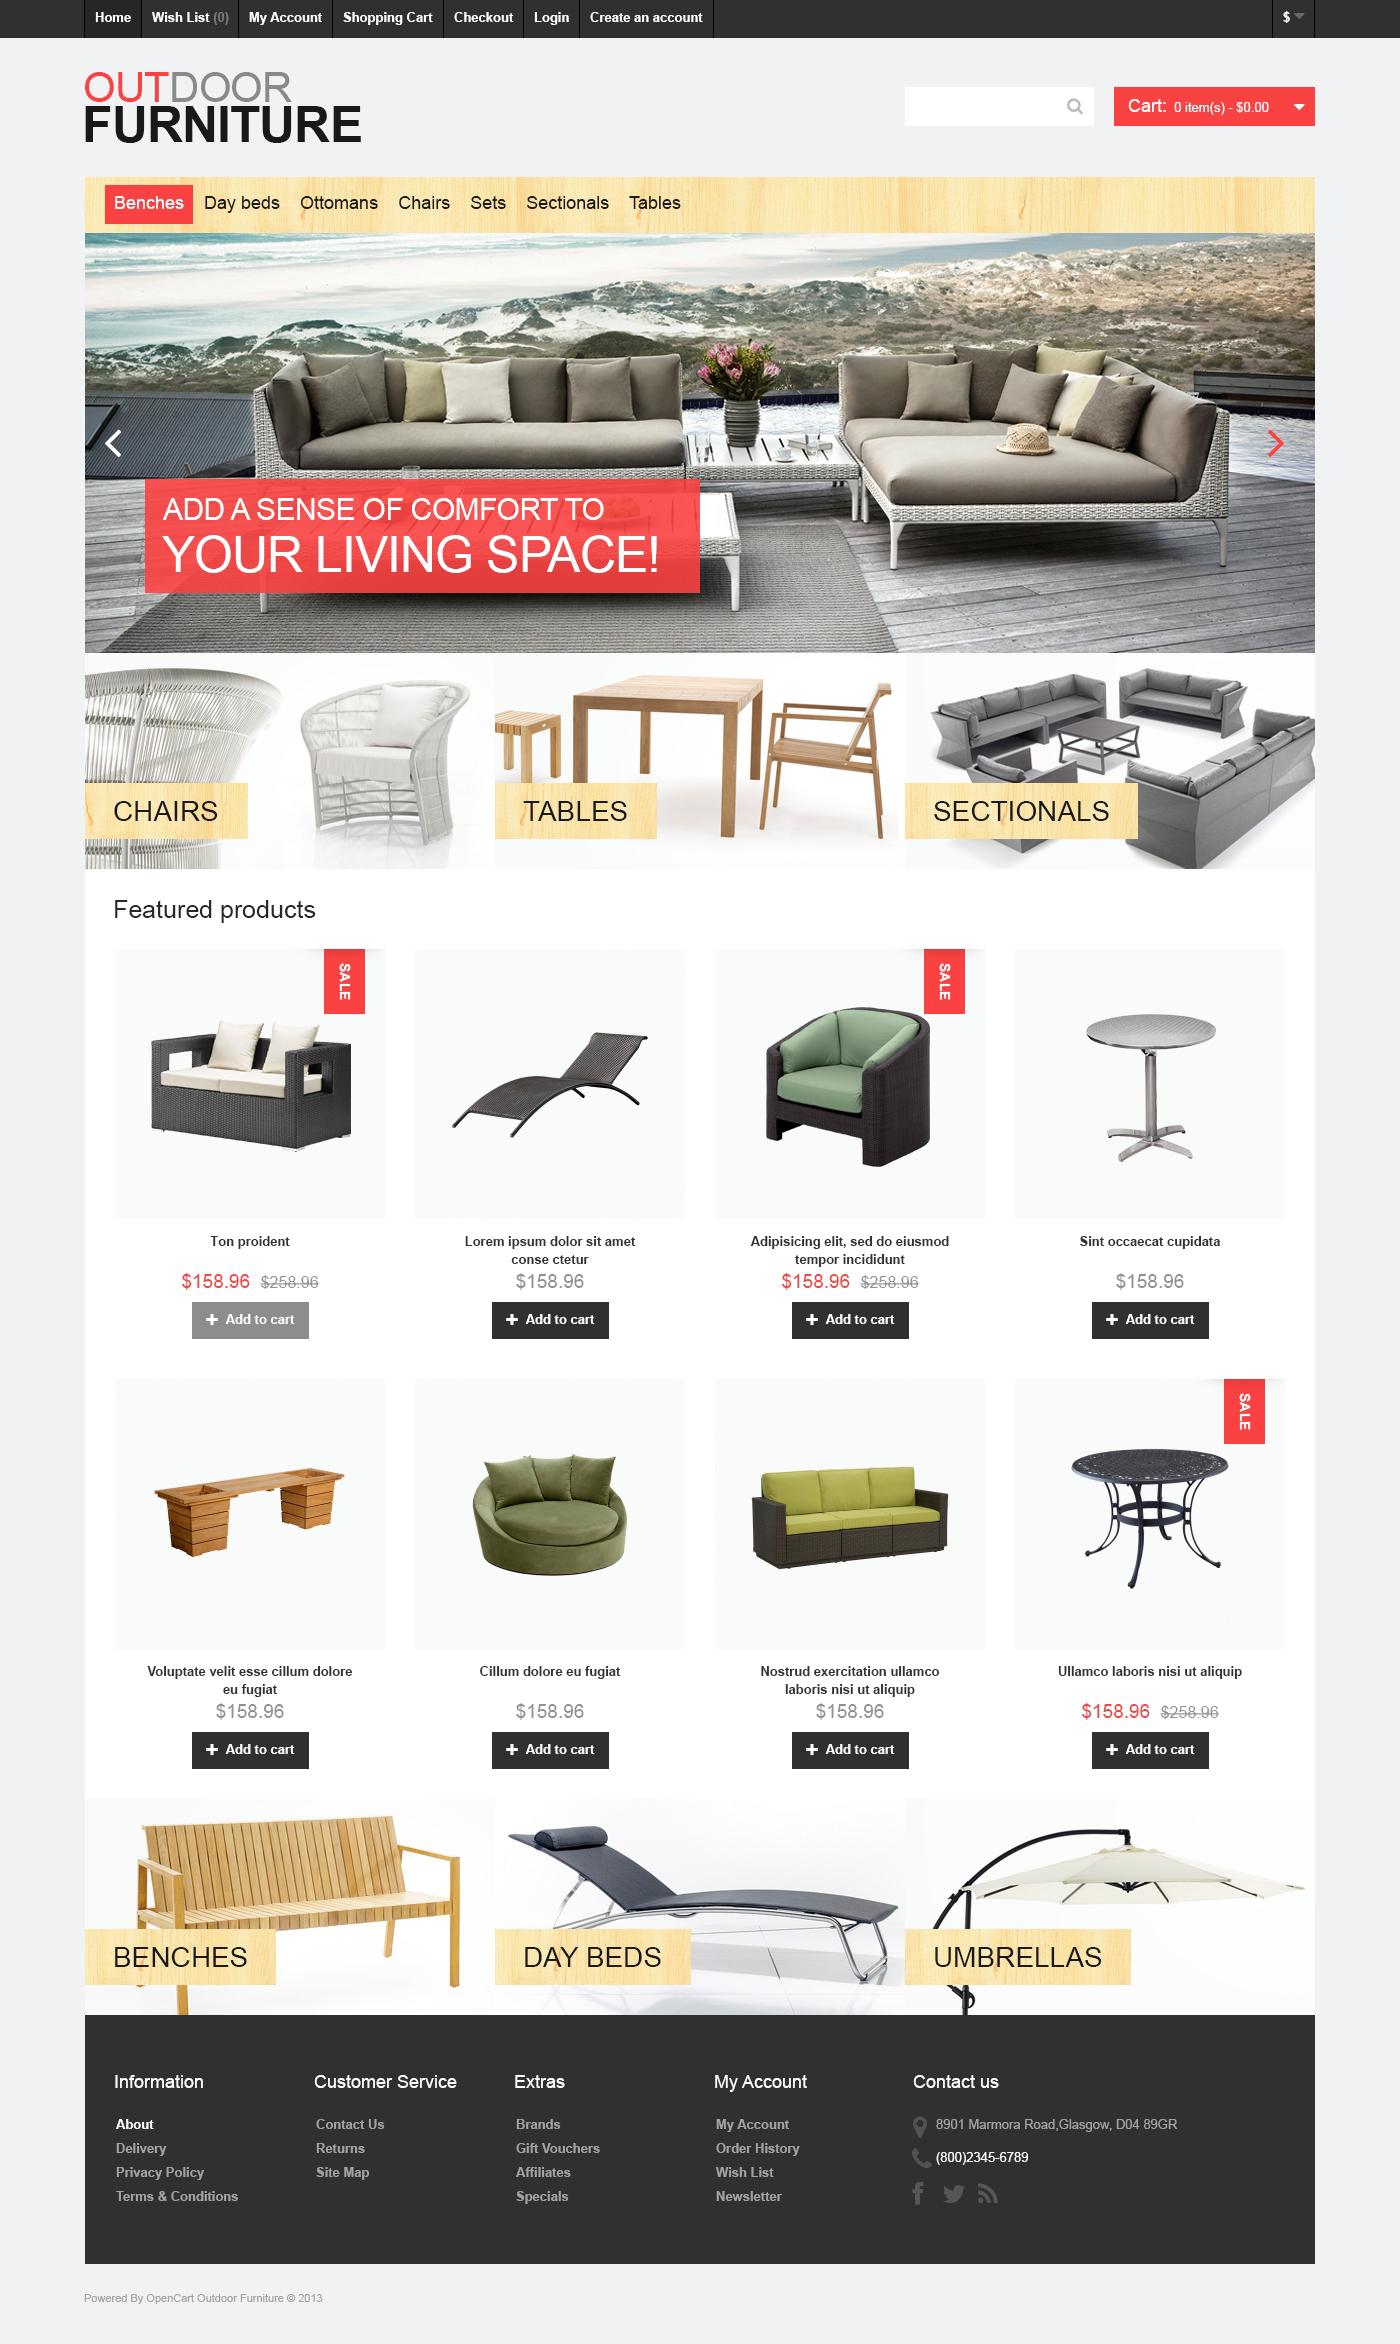 Outdoor Furniture Template OpenCart №46977 - screenshot